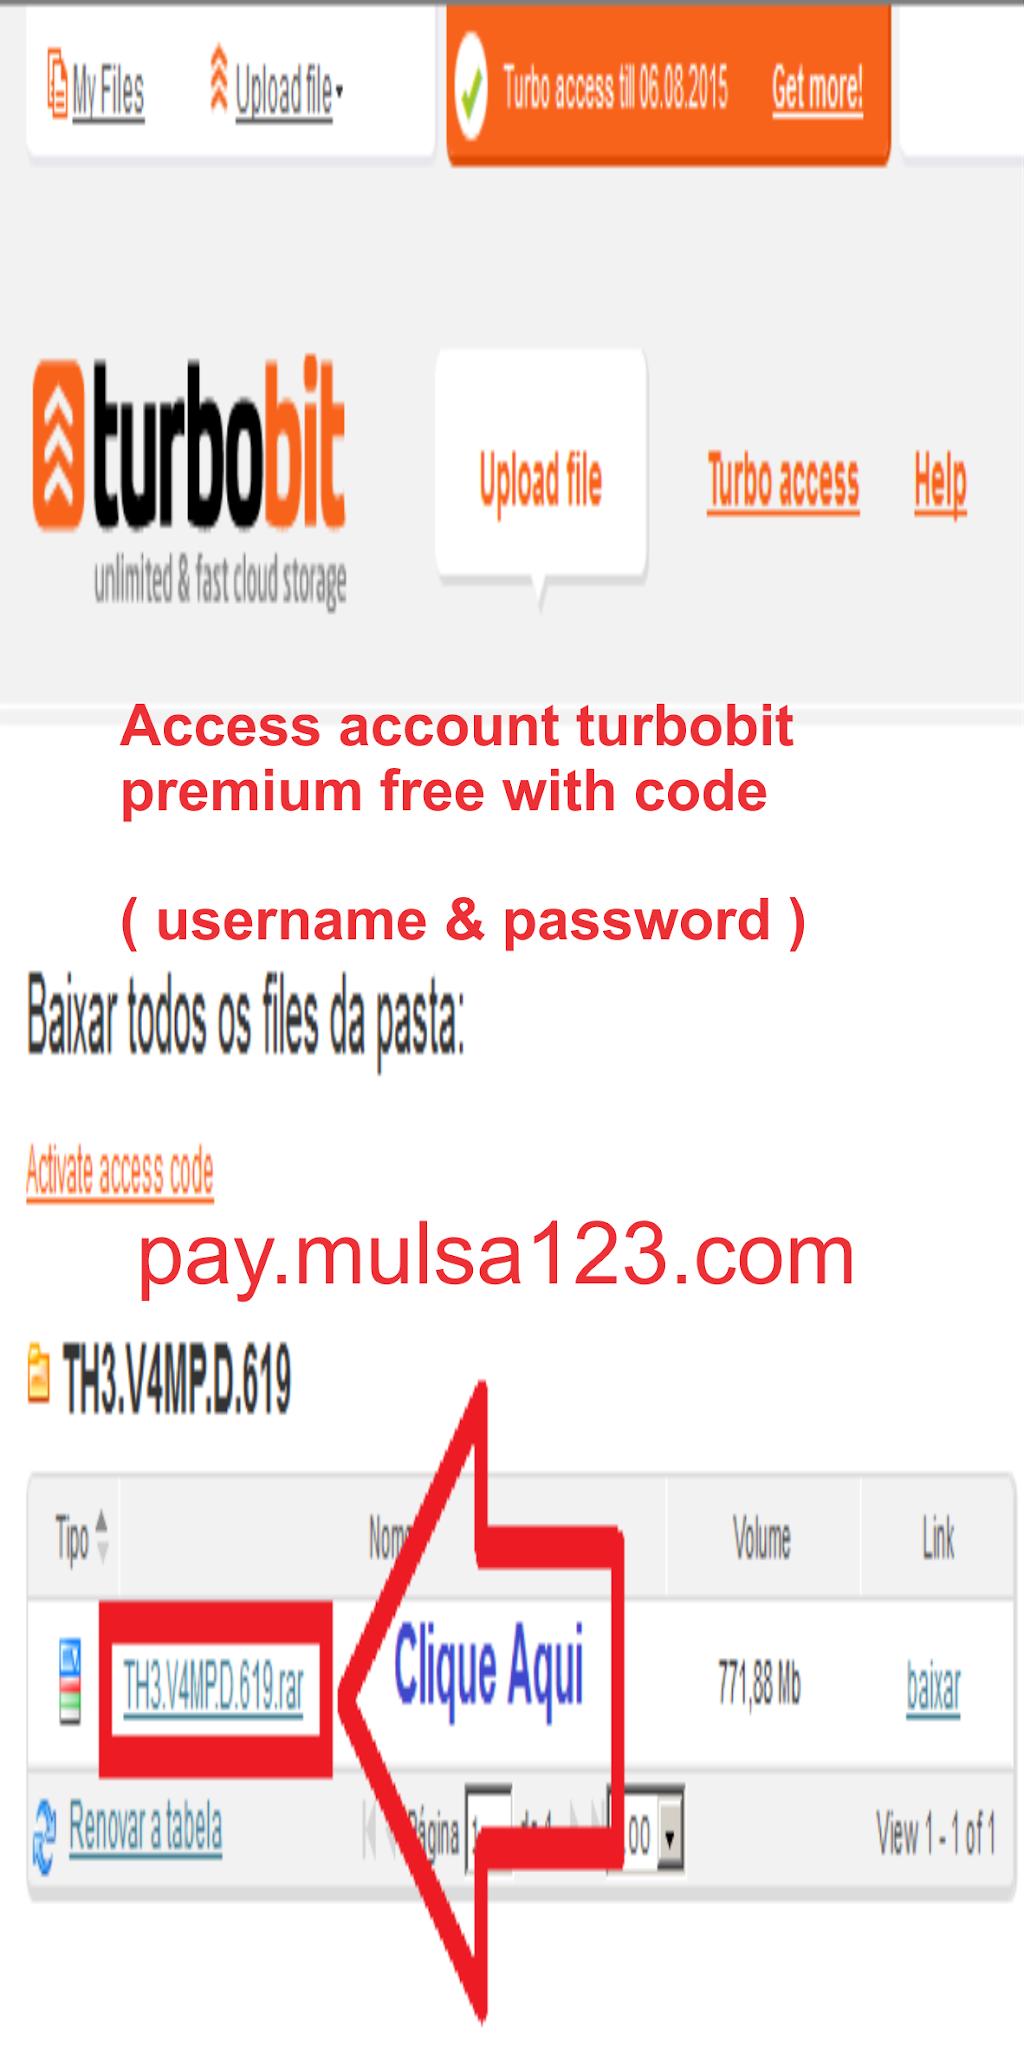 Access account turbobit premium free with code ( username & password )